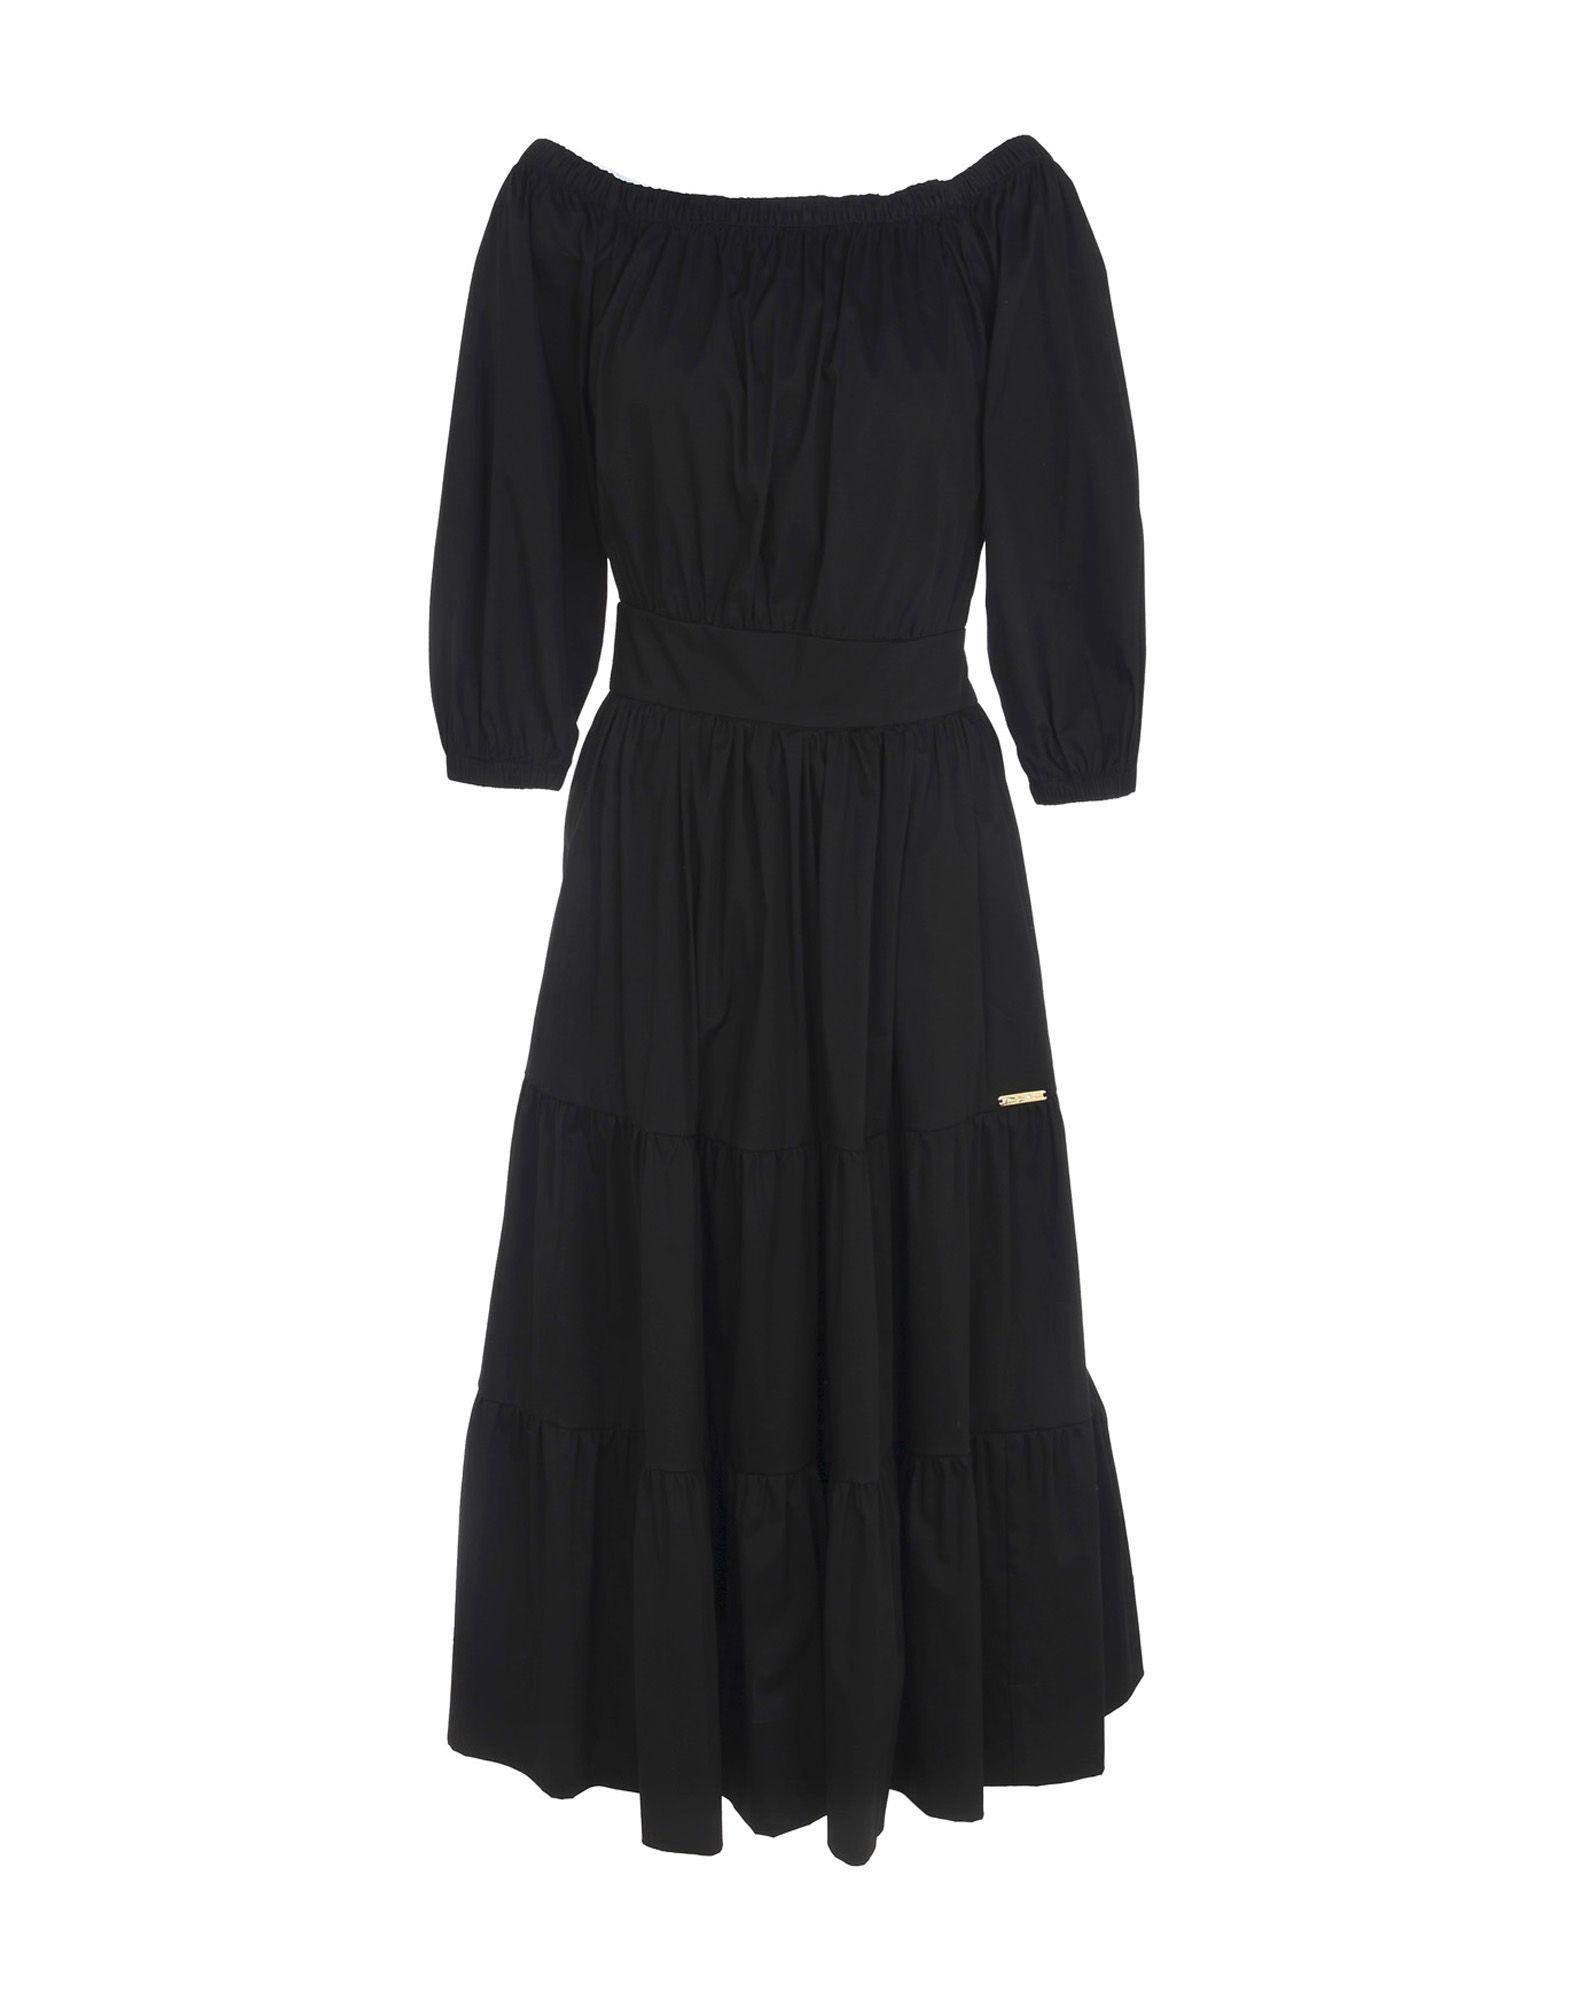 DRESSES - 3/4 length dresses Mariagrazia Panizzi cvPuG